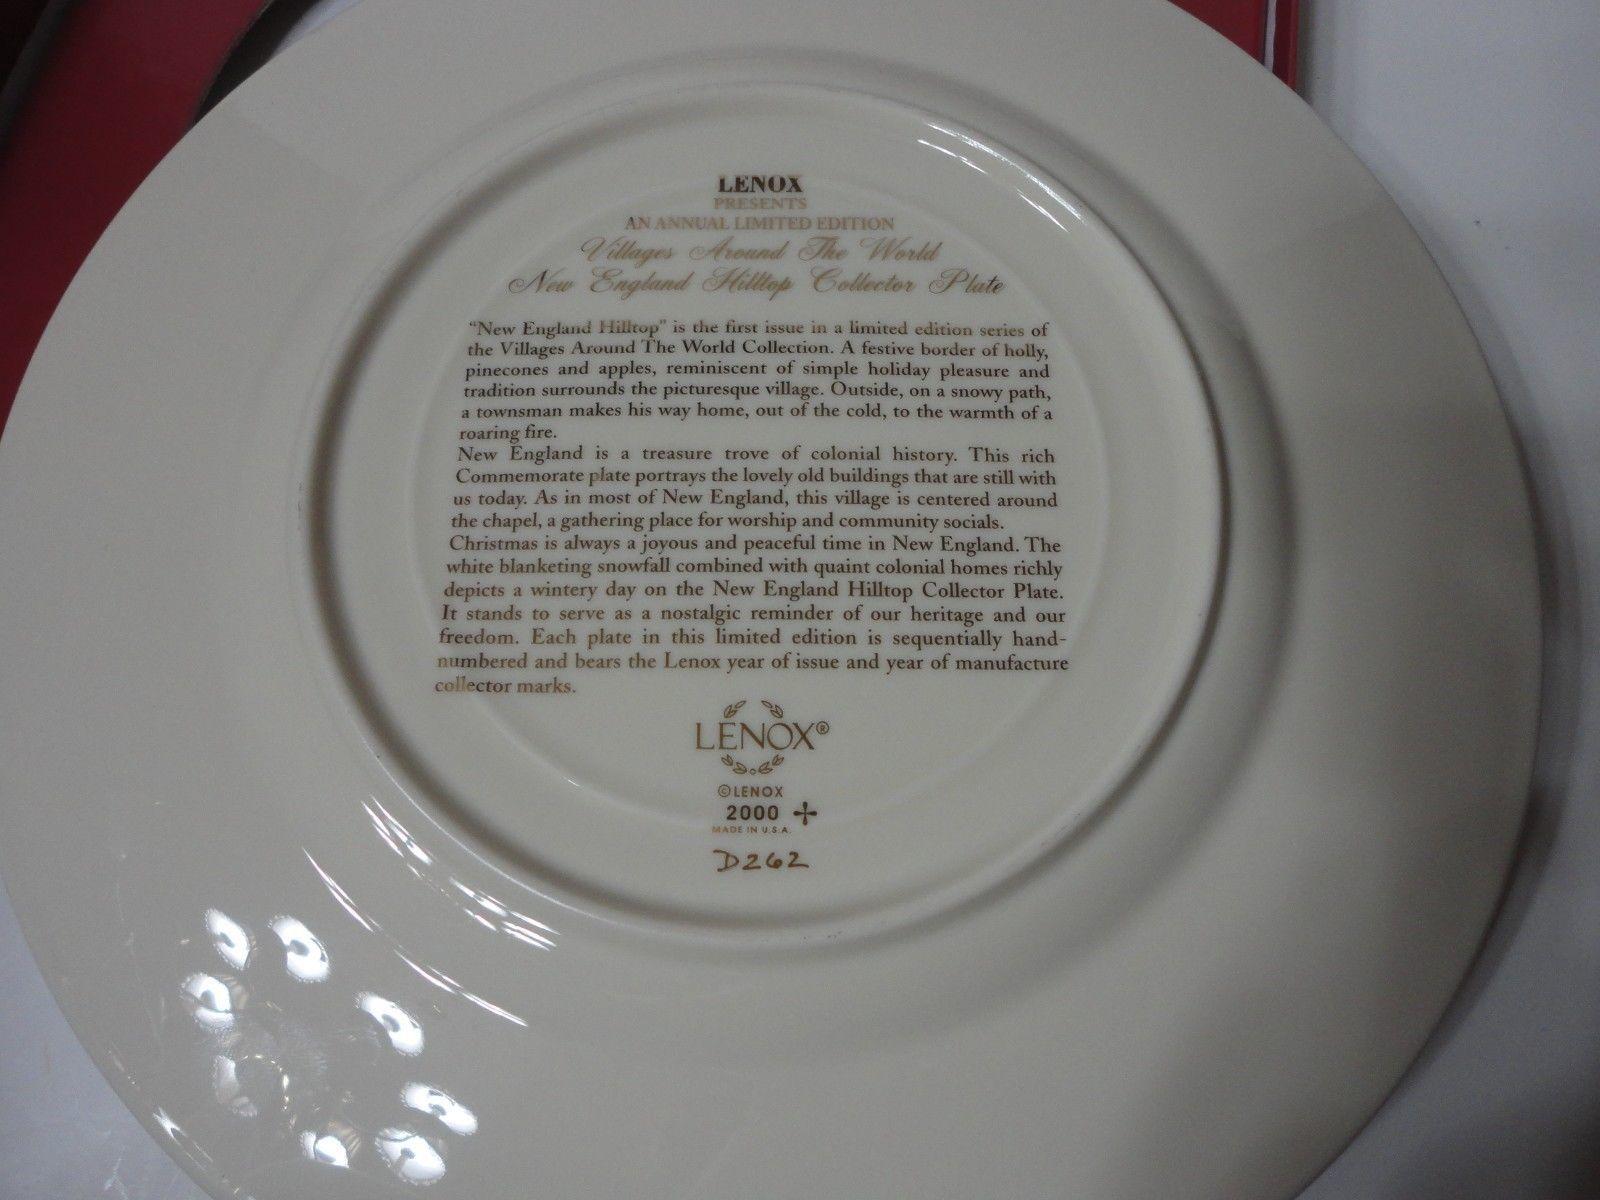 2000 LENOX CHRISTMAS VILLAGES AROUND WORLD NEW ENGLAND HILLTOP ANNUAL PLATE MIB